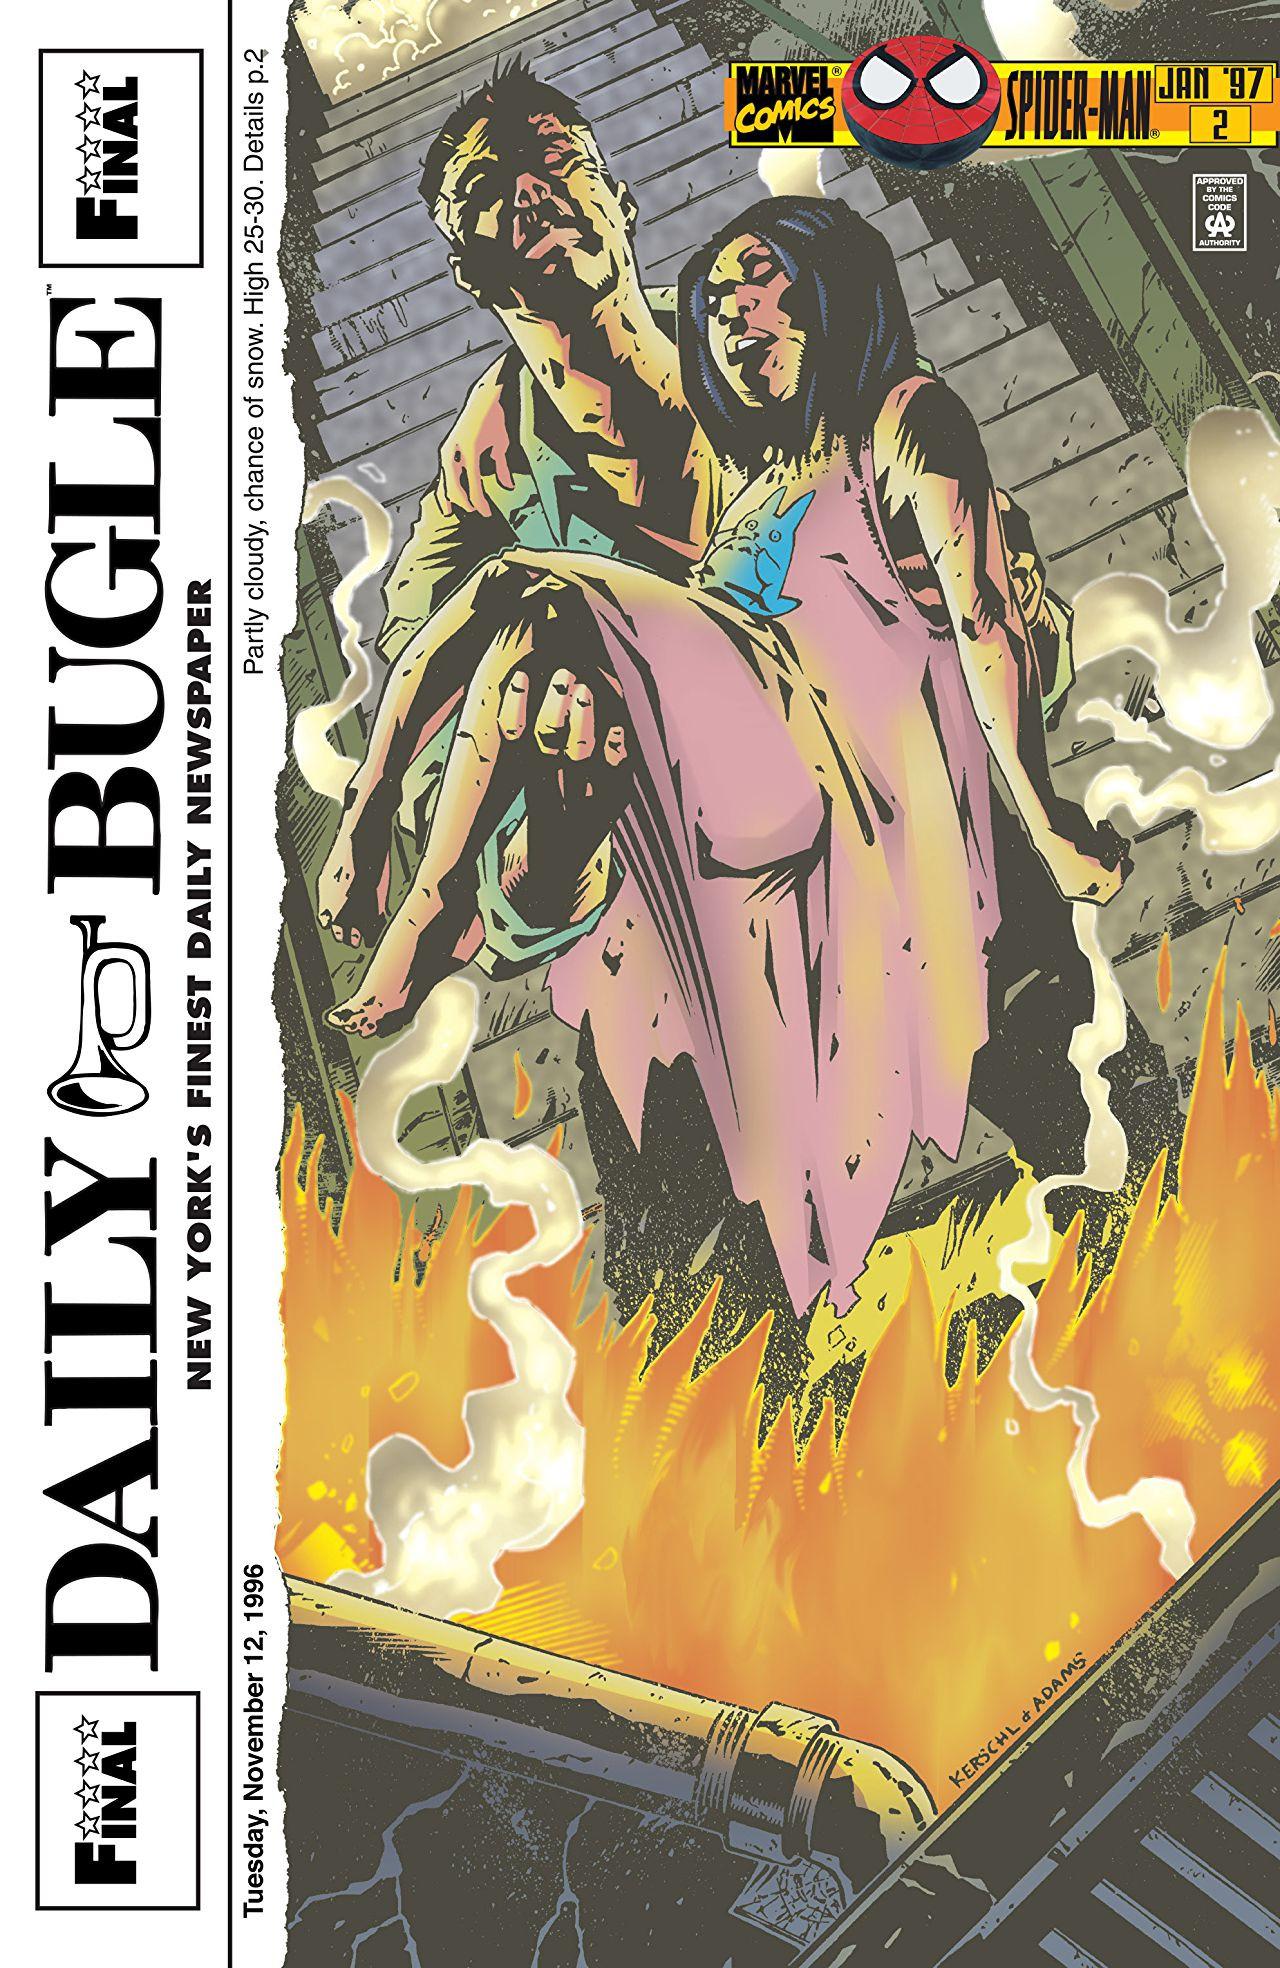 Daily Bugle Vol 1 2.jpg